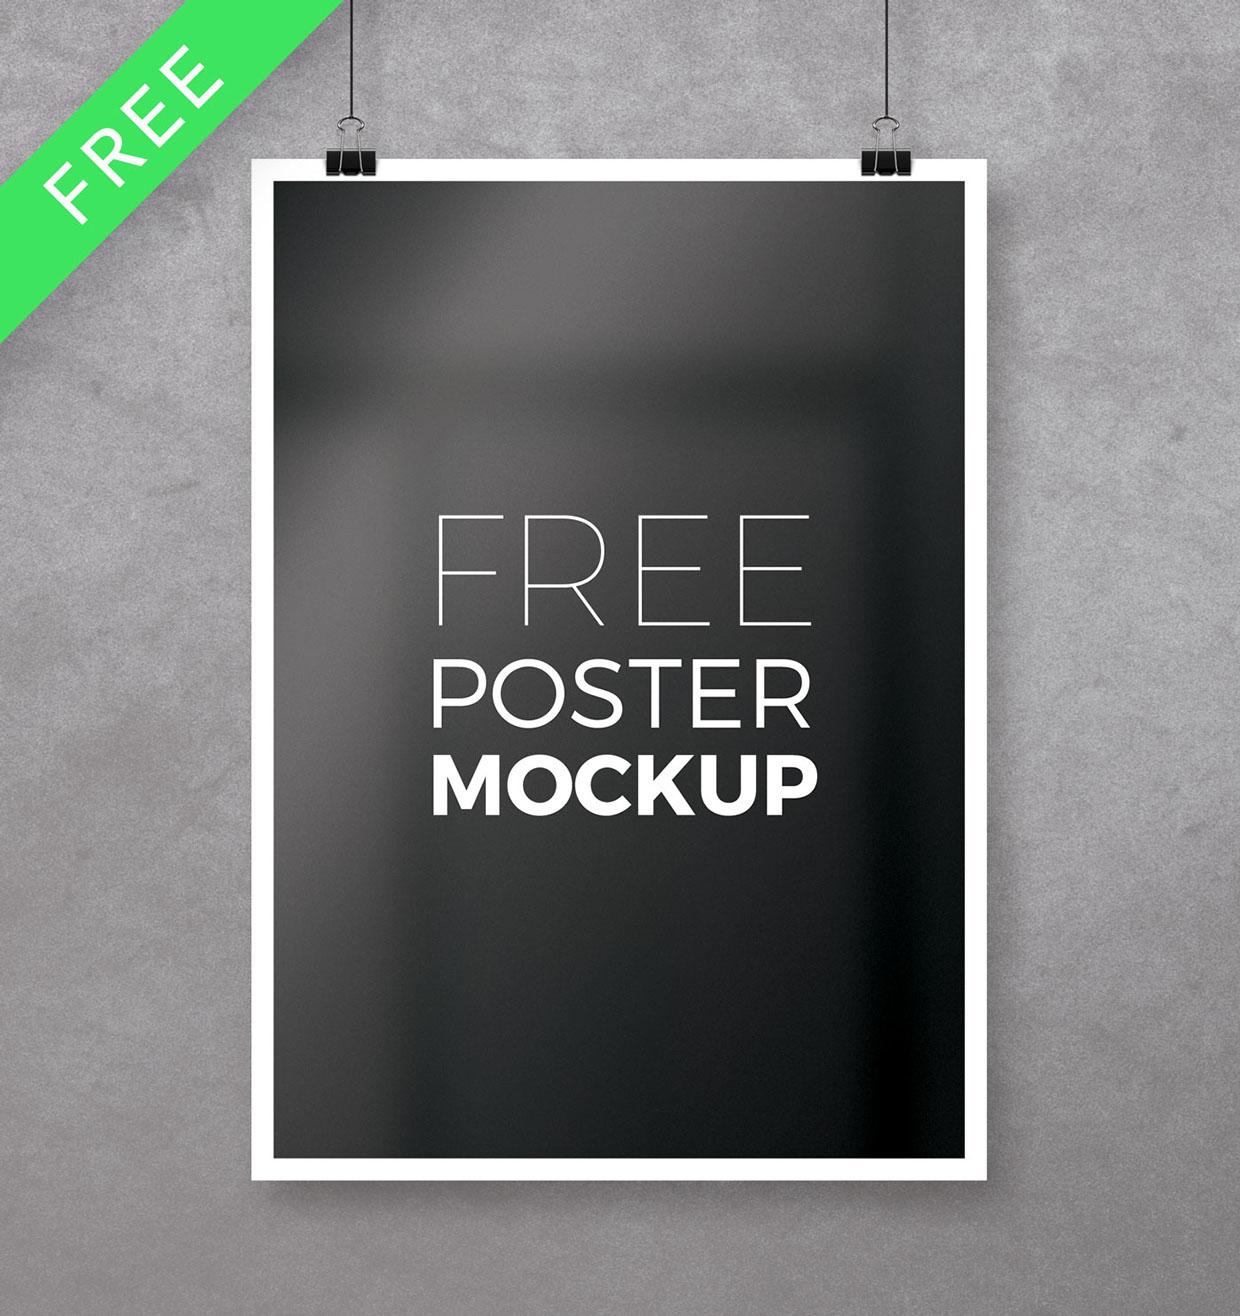 Free A4 Poster Mockup Freebies Fribly